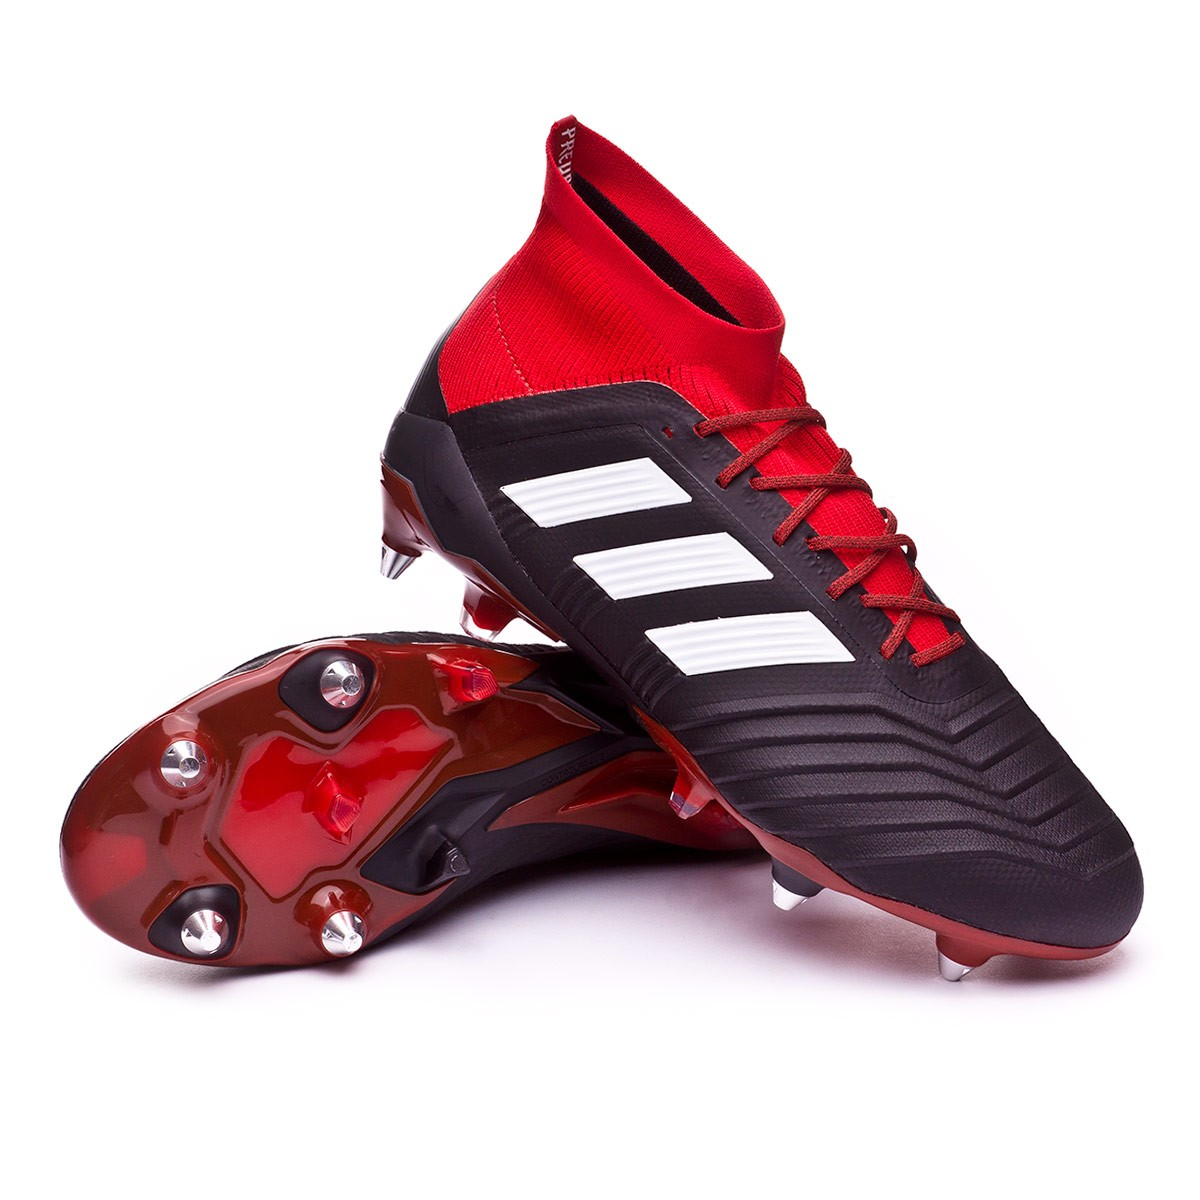 bota-adidas-predator-18.1-sg-core-black-